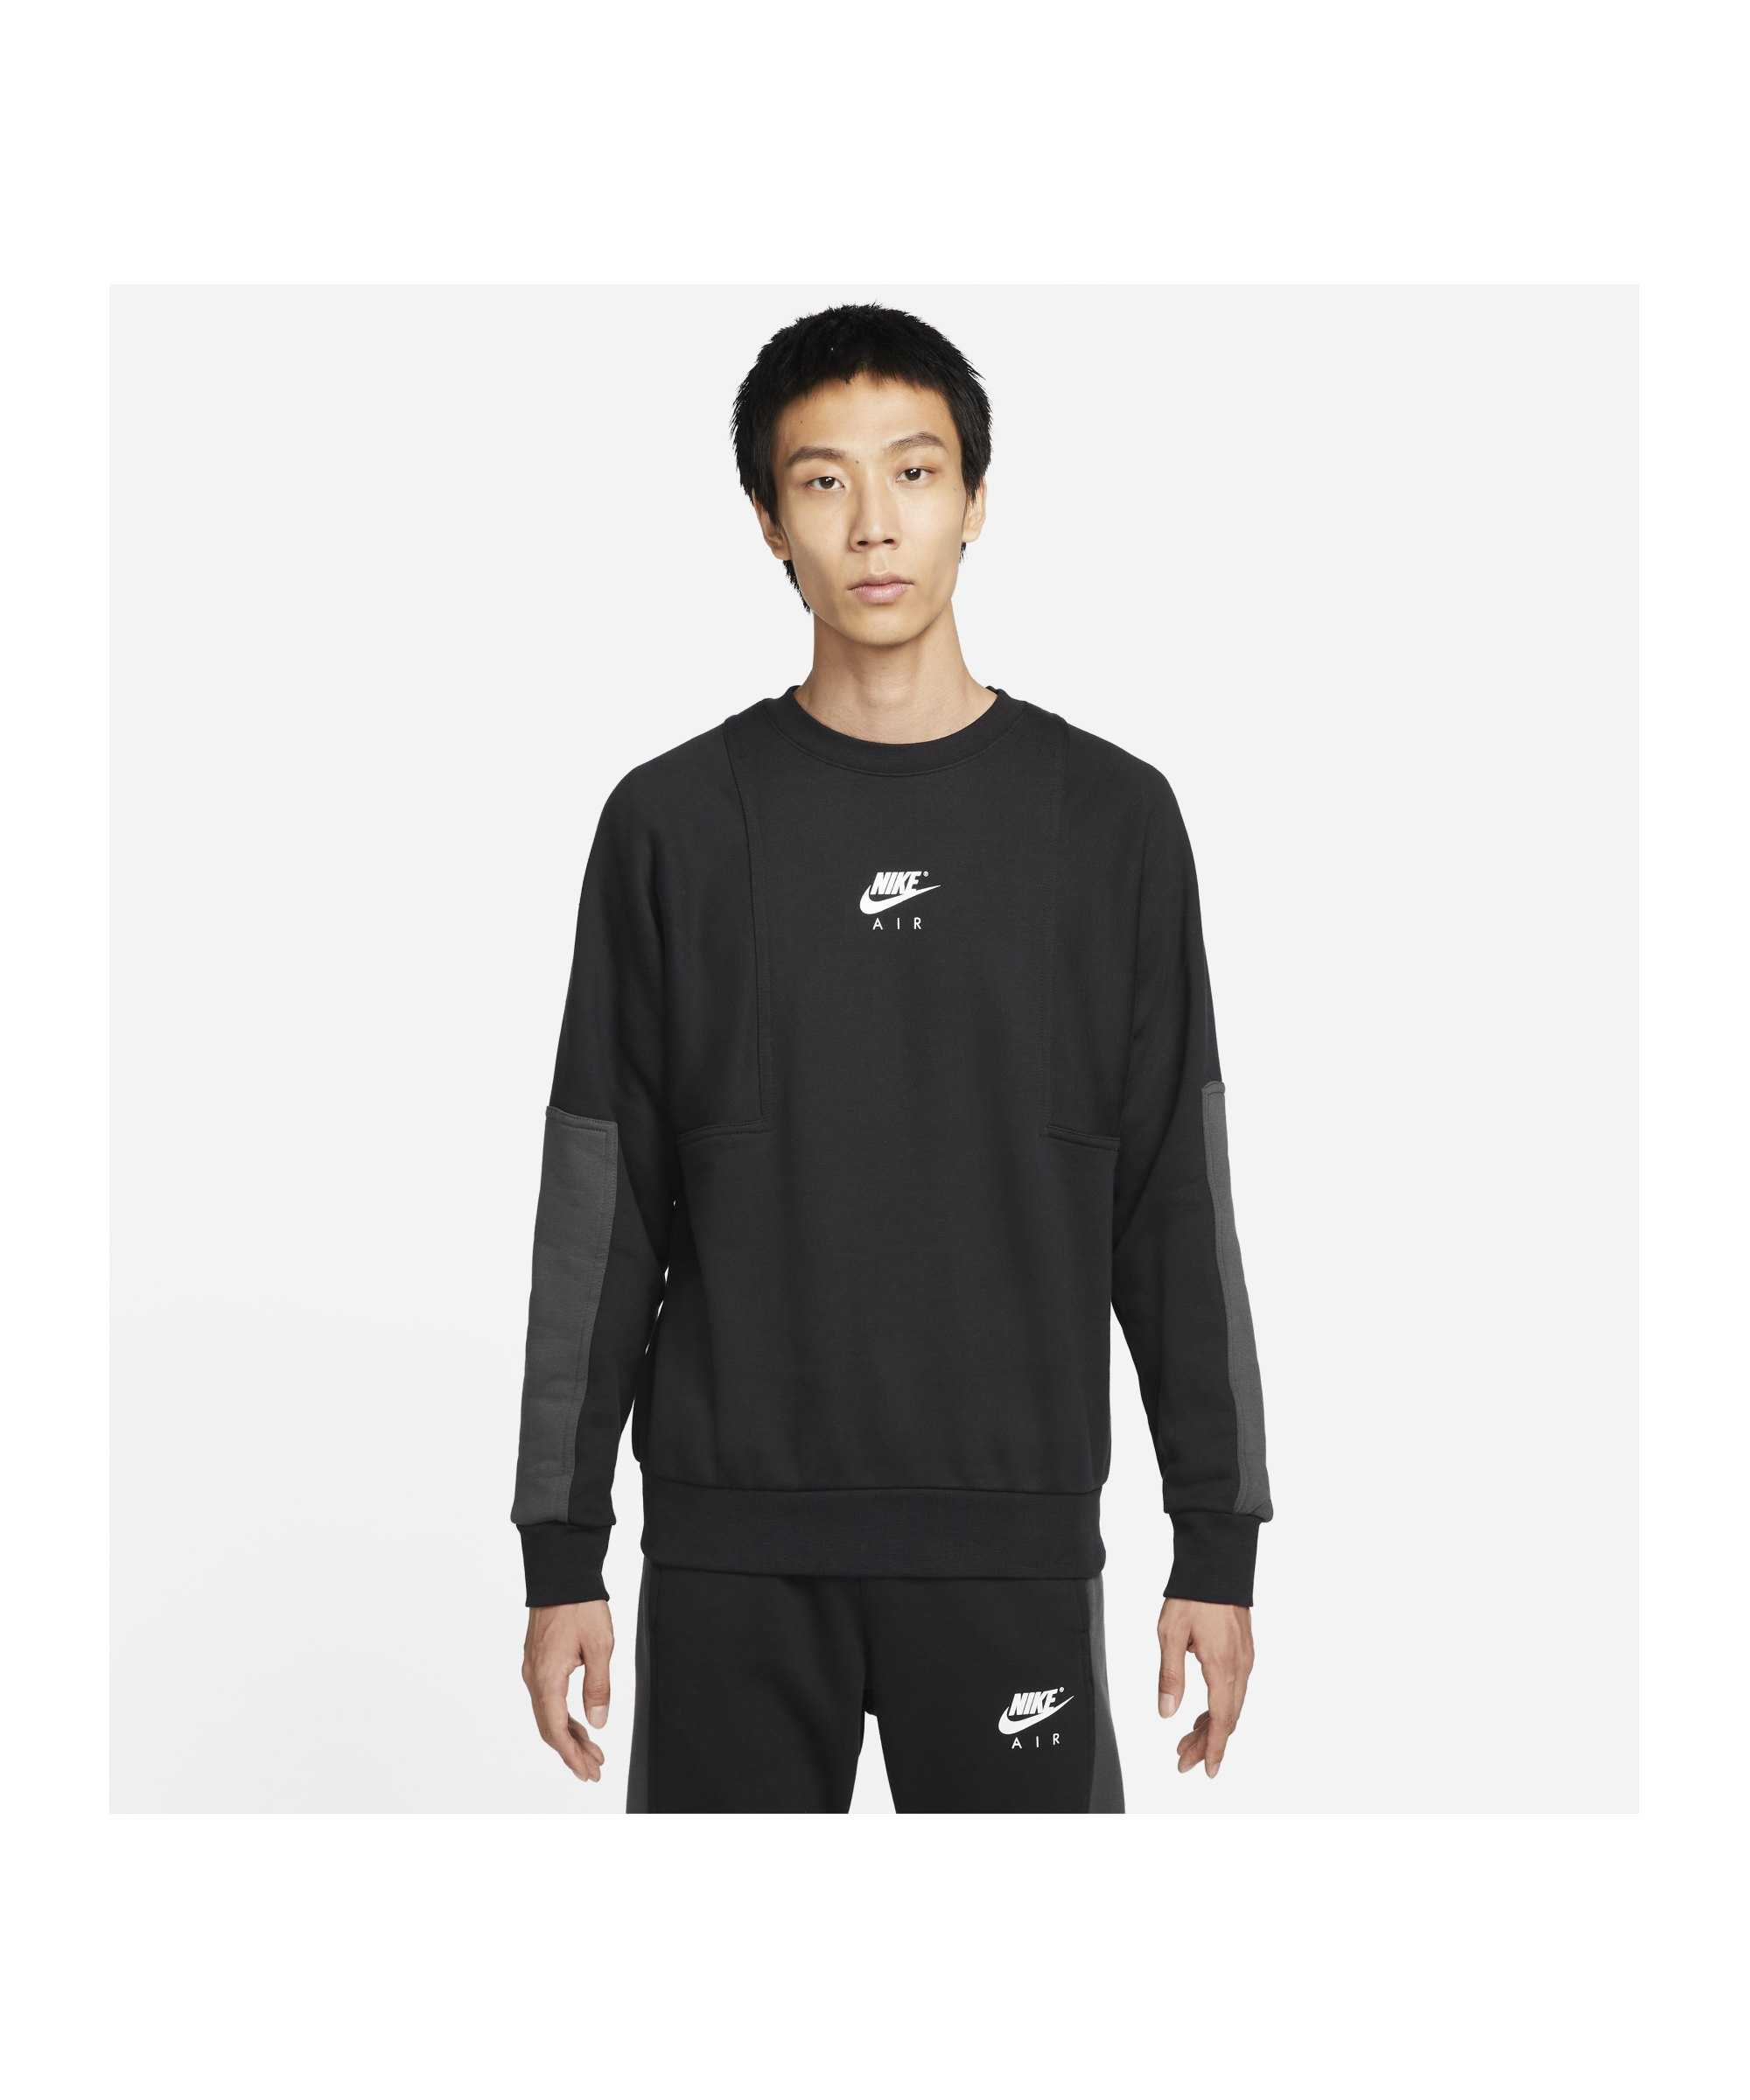 Nike Air Brushed-Back Fleece Crew Sweatshirt F010 - schwarz